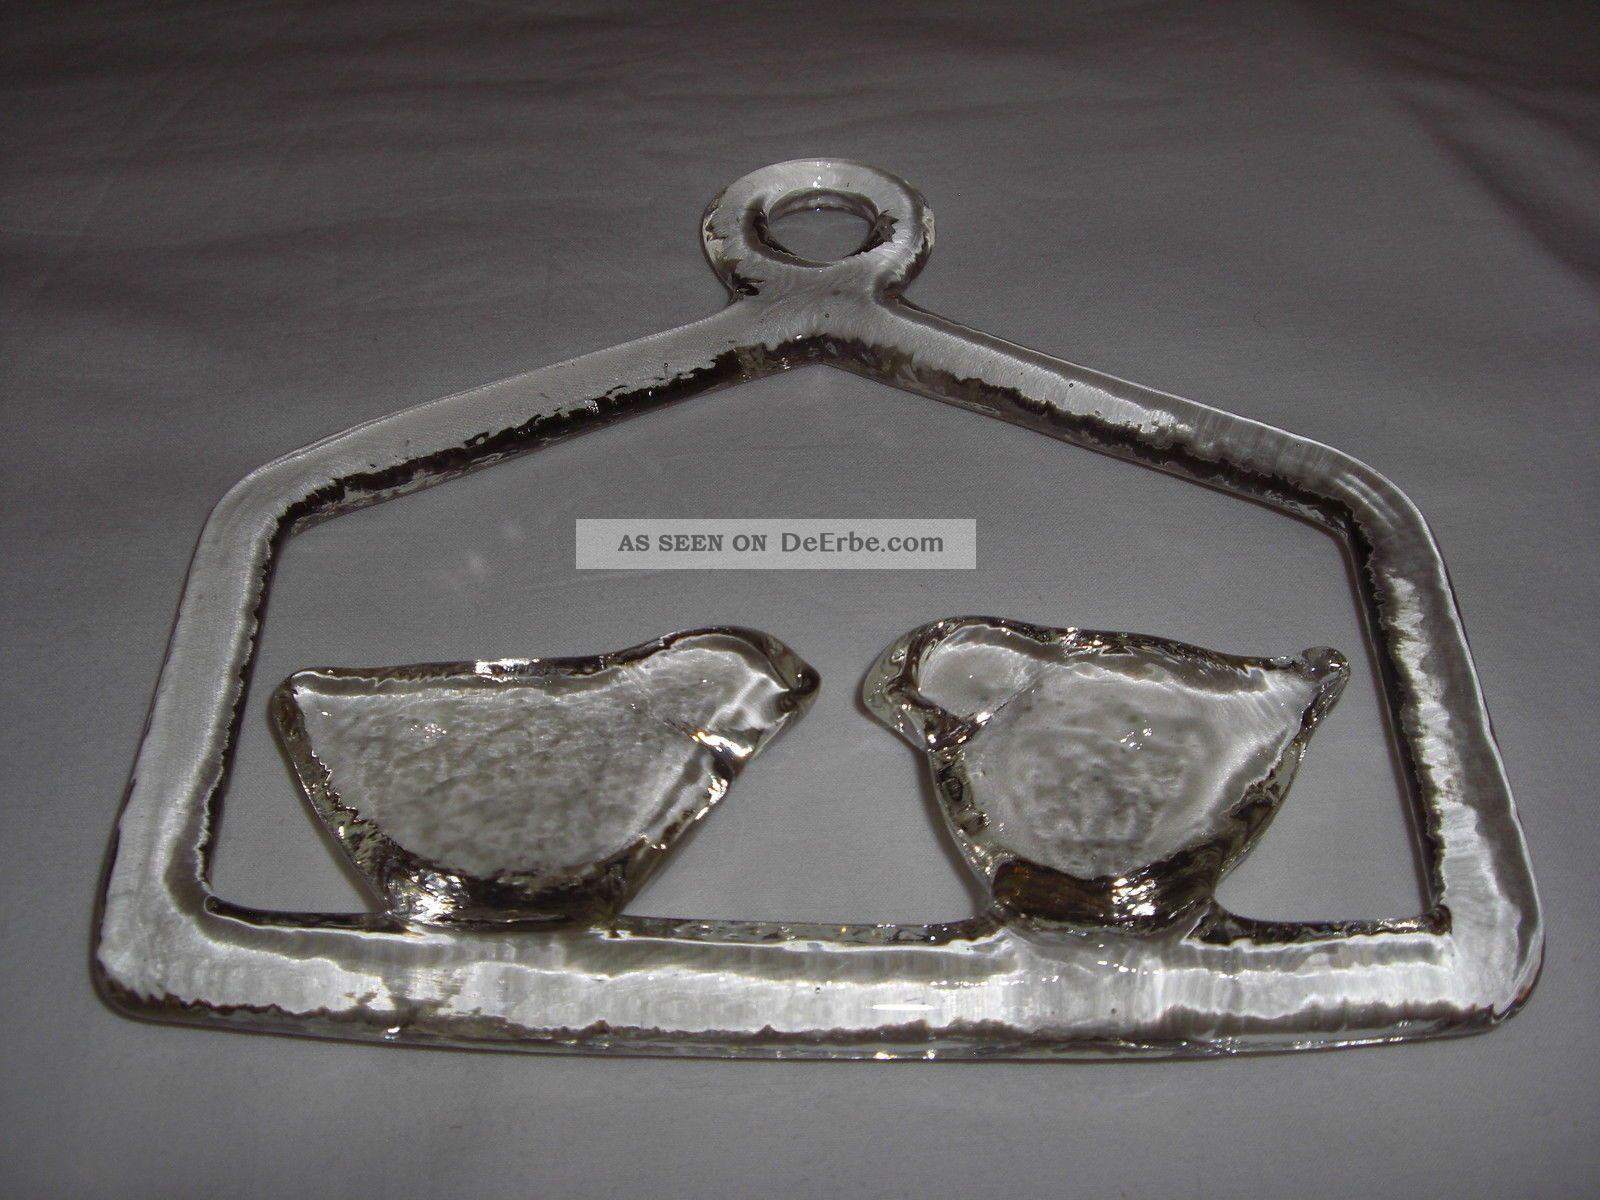 fensterbild glasbild schweden design pukeberg kosta boda. Black Bedroom Furniture Sets. Home Design Ideas